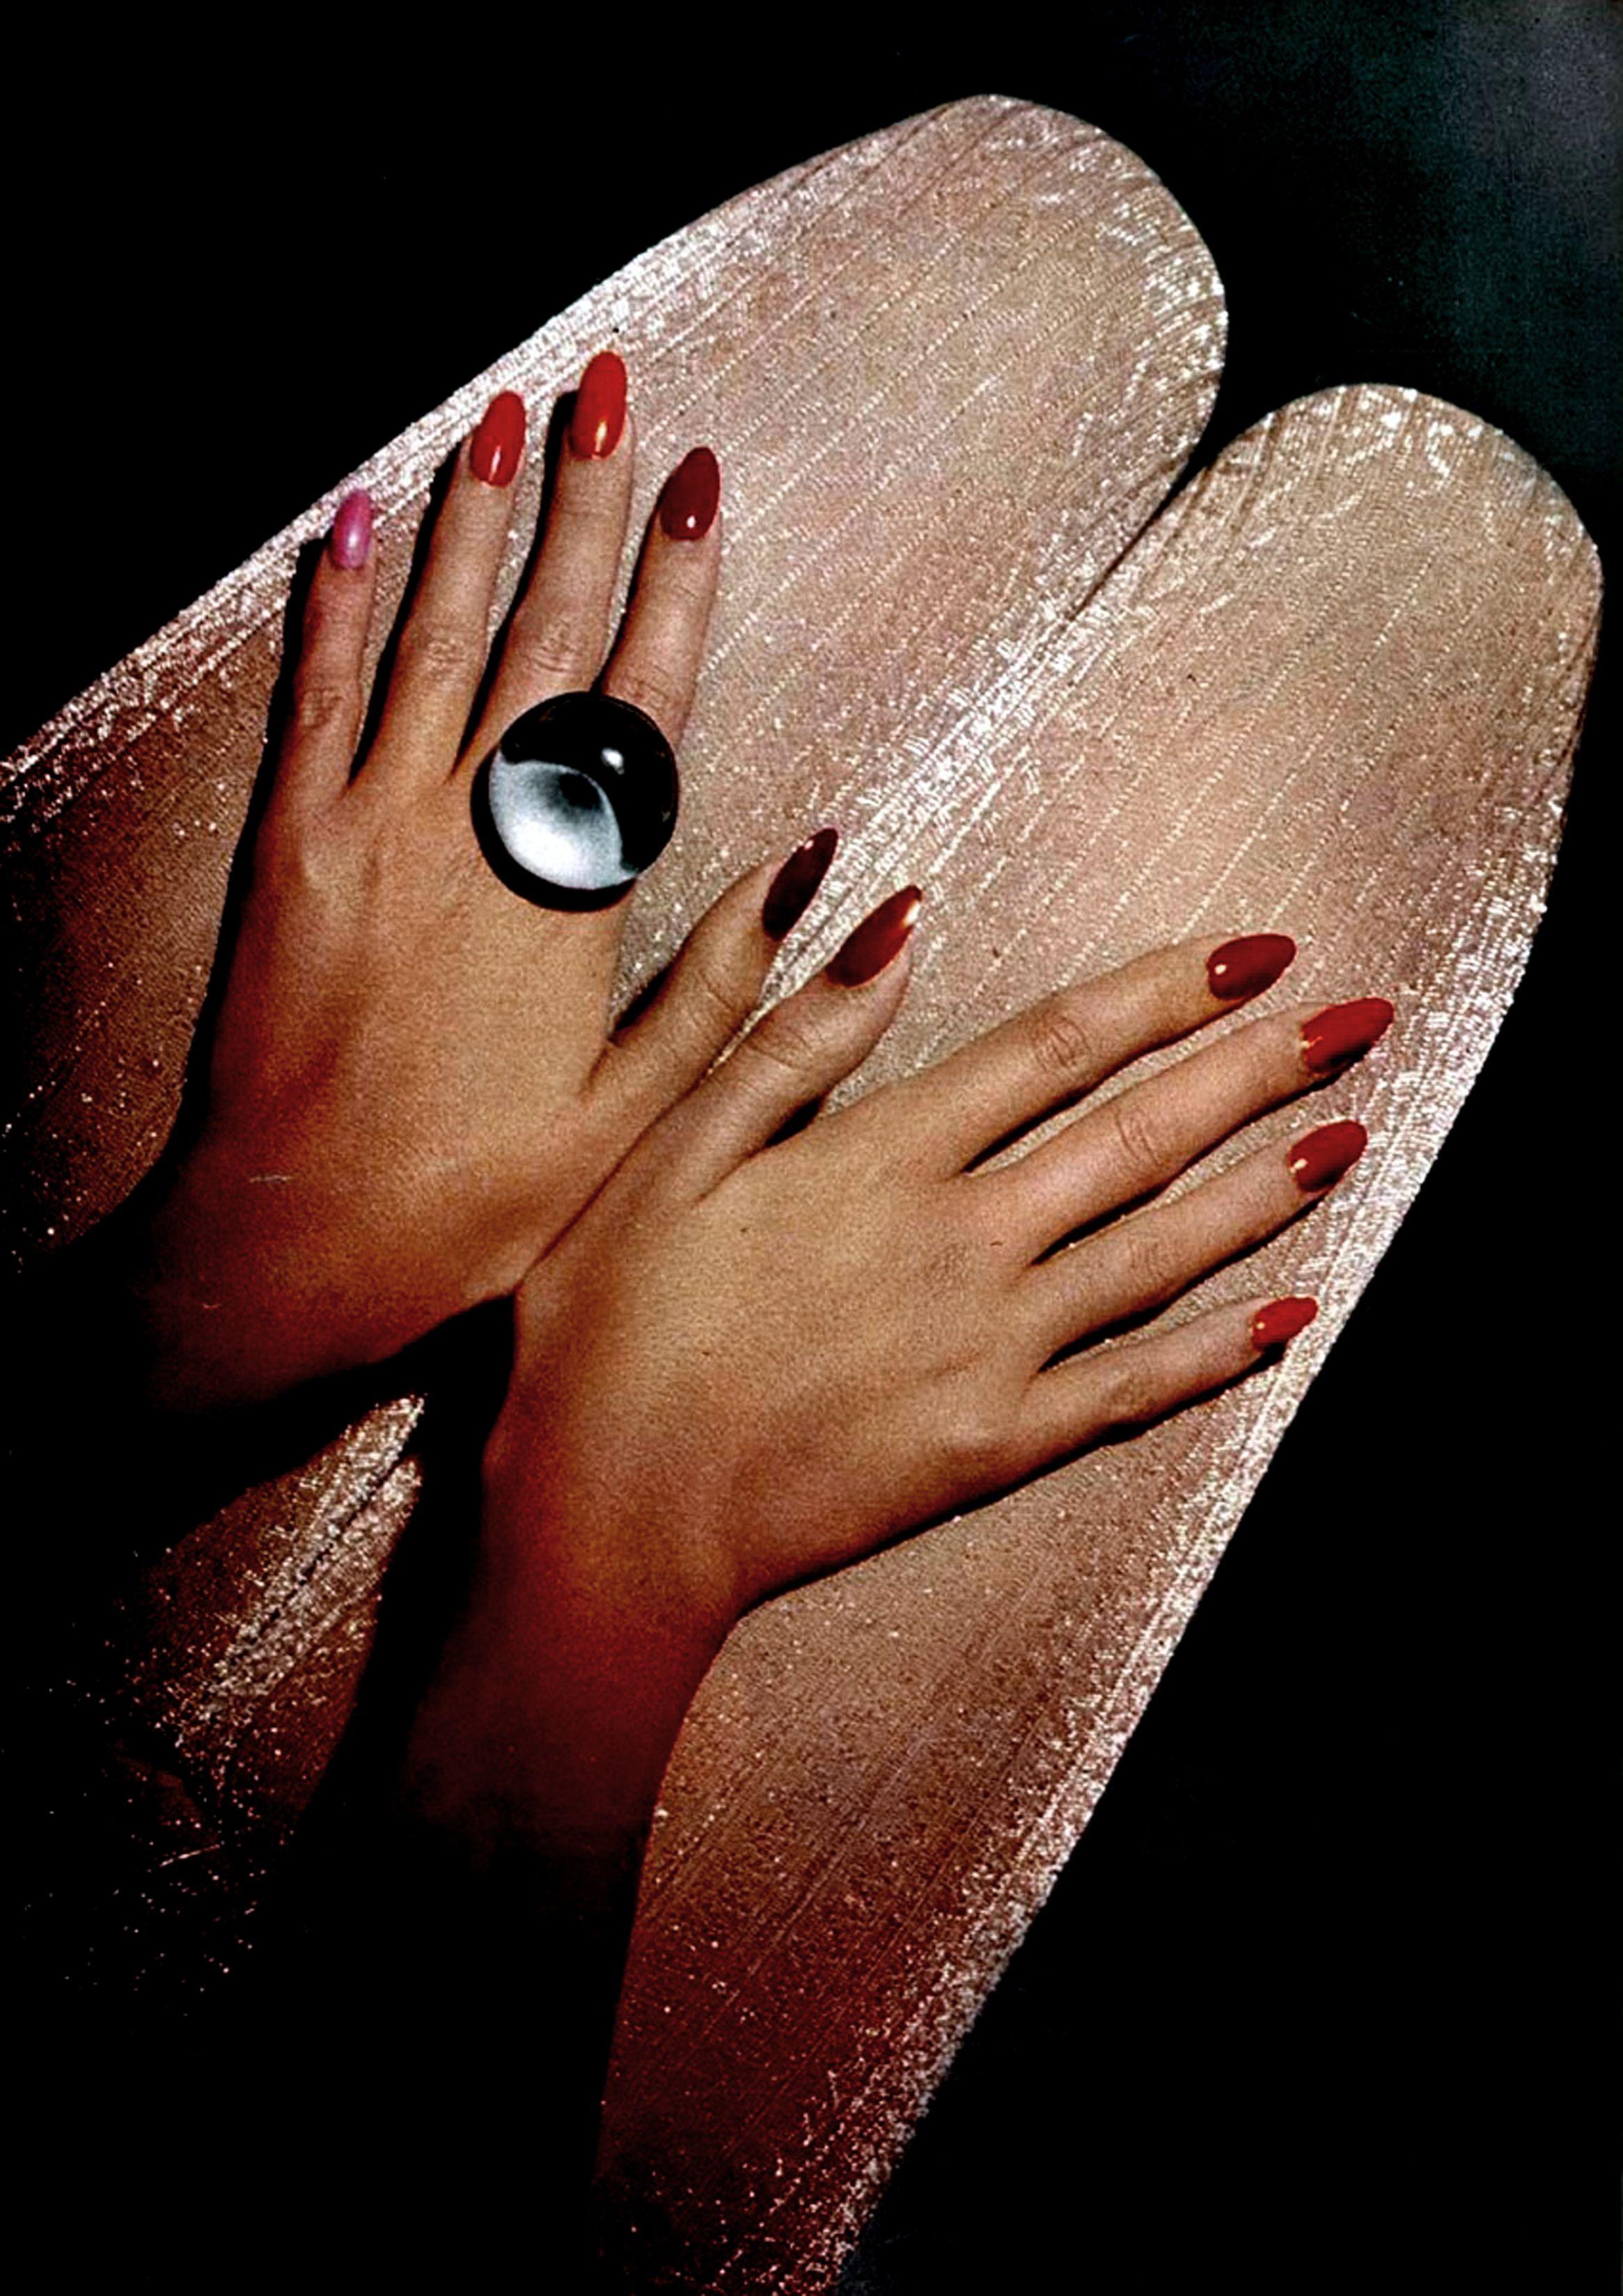 Pin by Olivia B on Favourite Photos | Fashion, 70s fashion, Nails